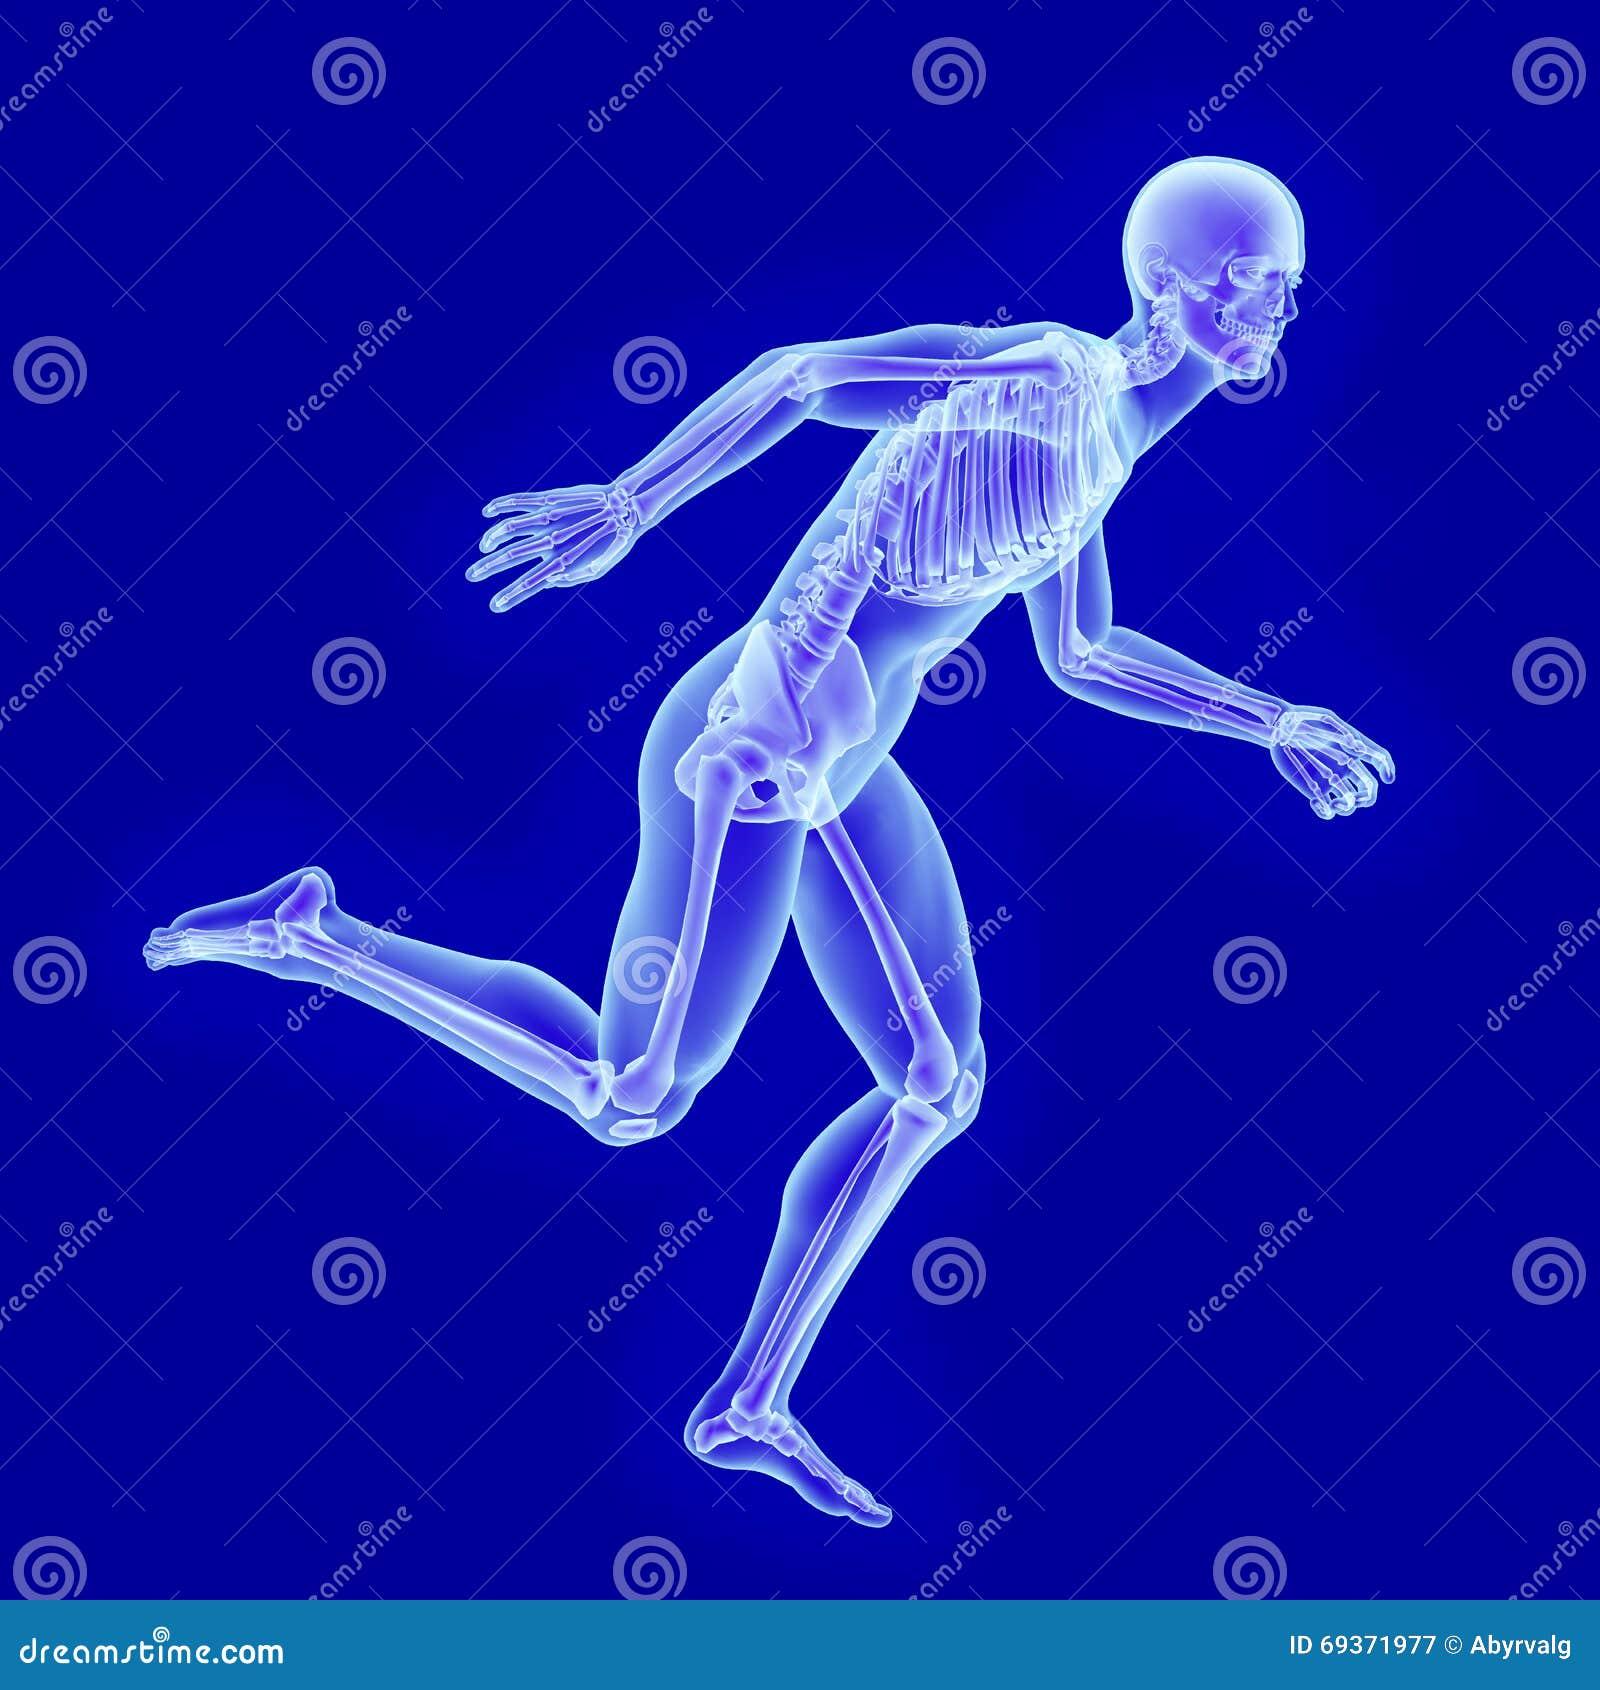 X-ray Anatomy Of Running Man Stock Illustration - Illustration of ...